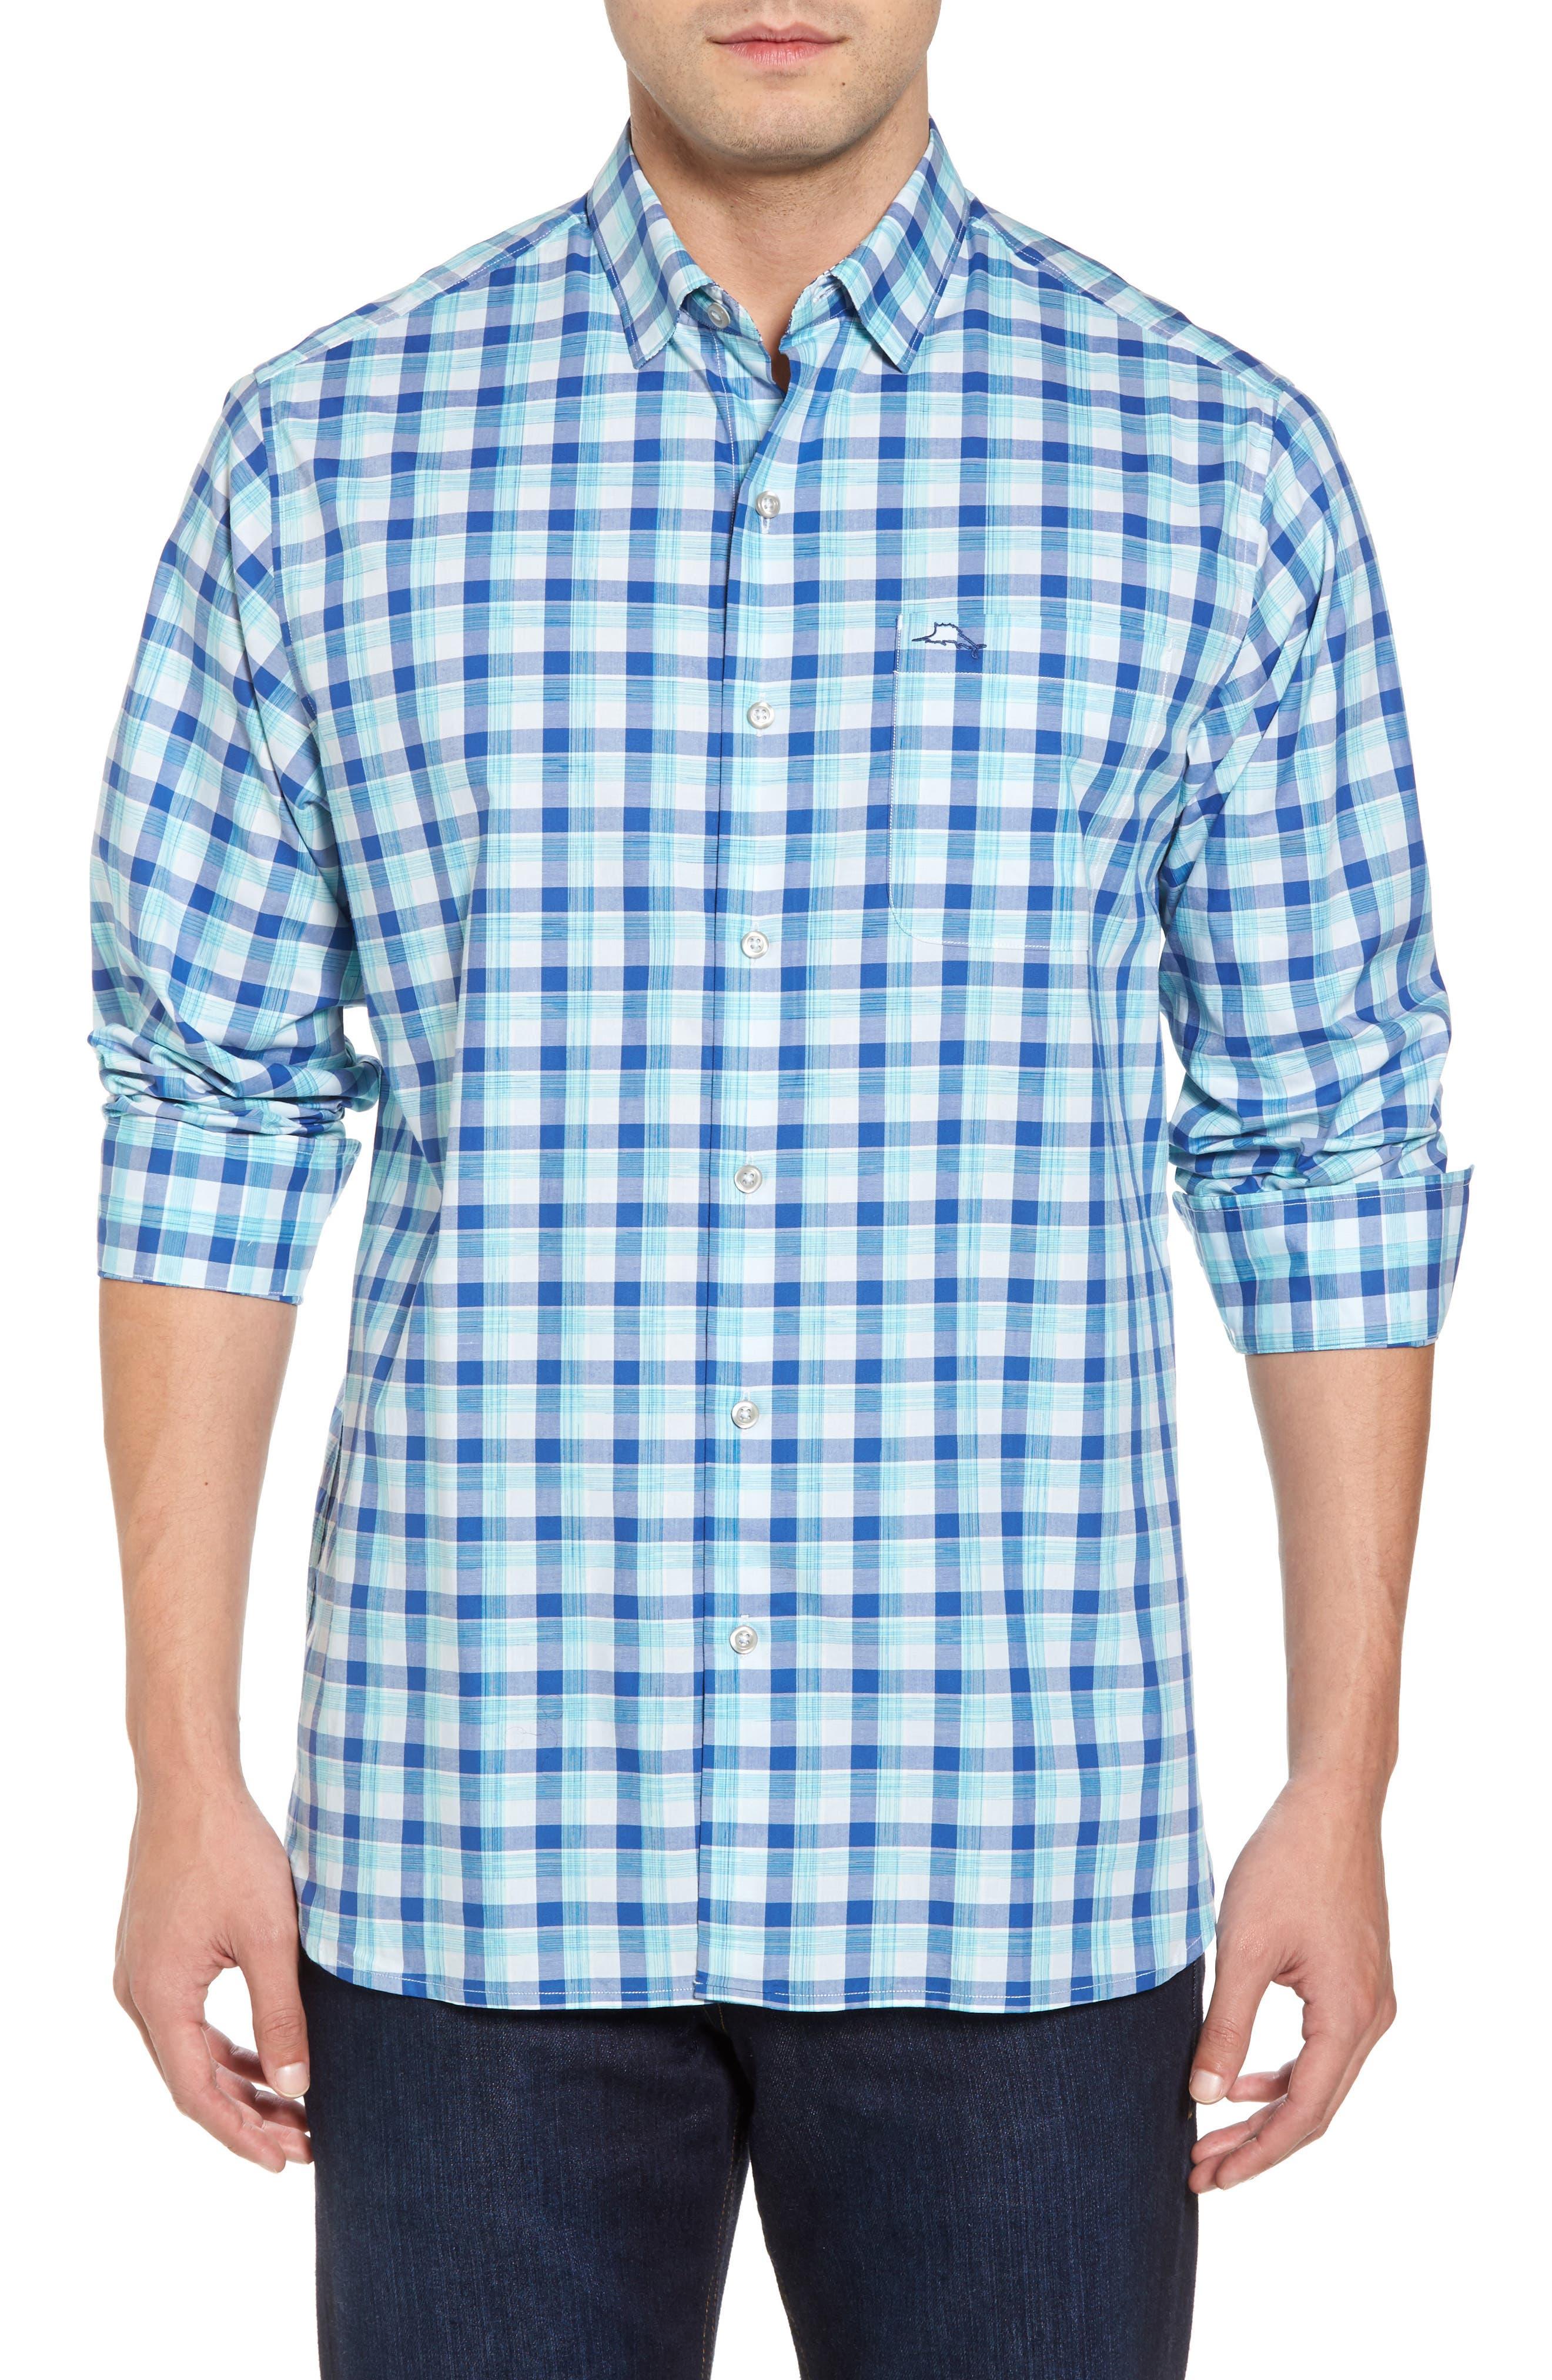 Atlantic Tides Regular Fit Plaid Sport Shirt,                         Main,                         color, Galaxy Blue